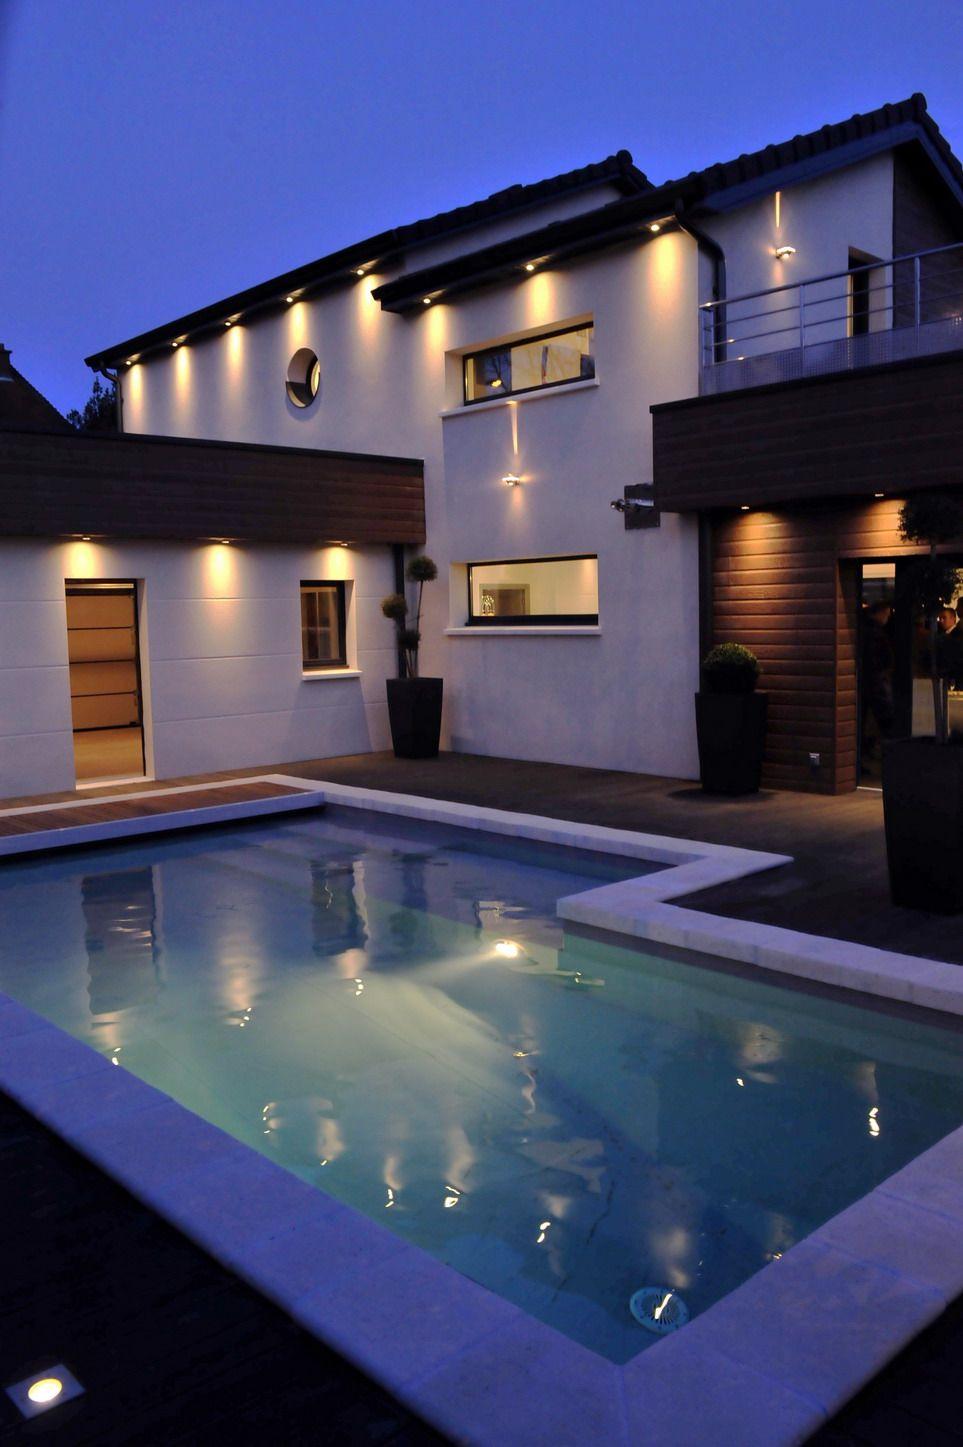 plan maison idale latest plan maison feng shui ideale with plan maison idale affordable feng. Black Bedroom Furniture Sets. Home Design Ideas